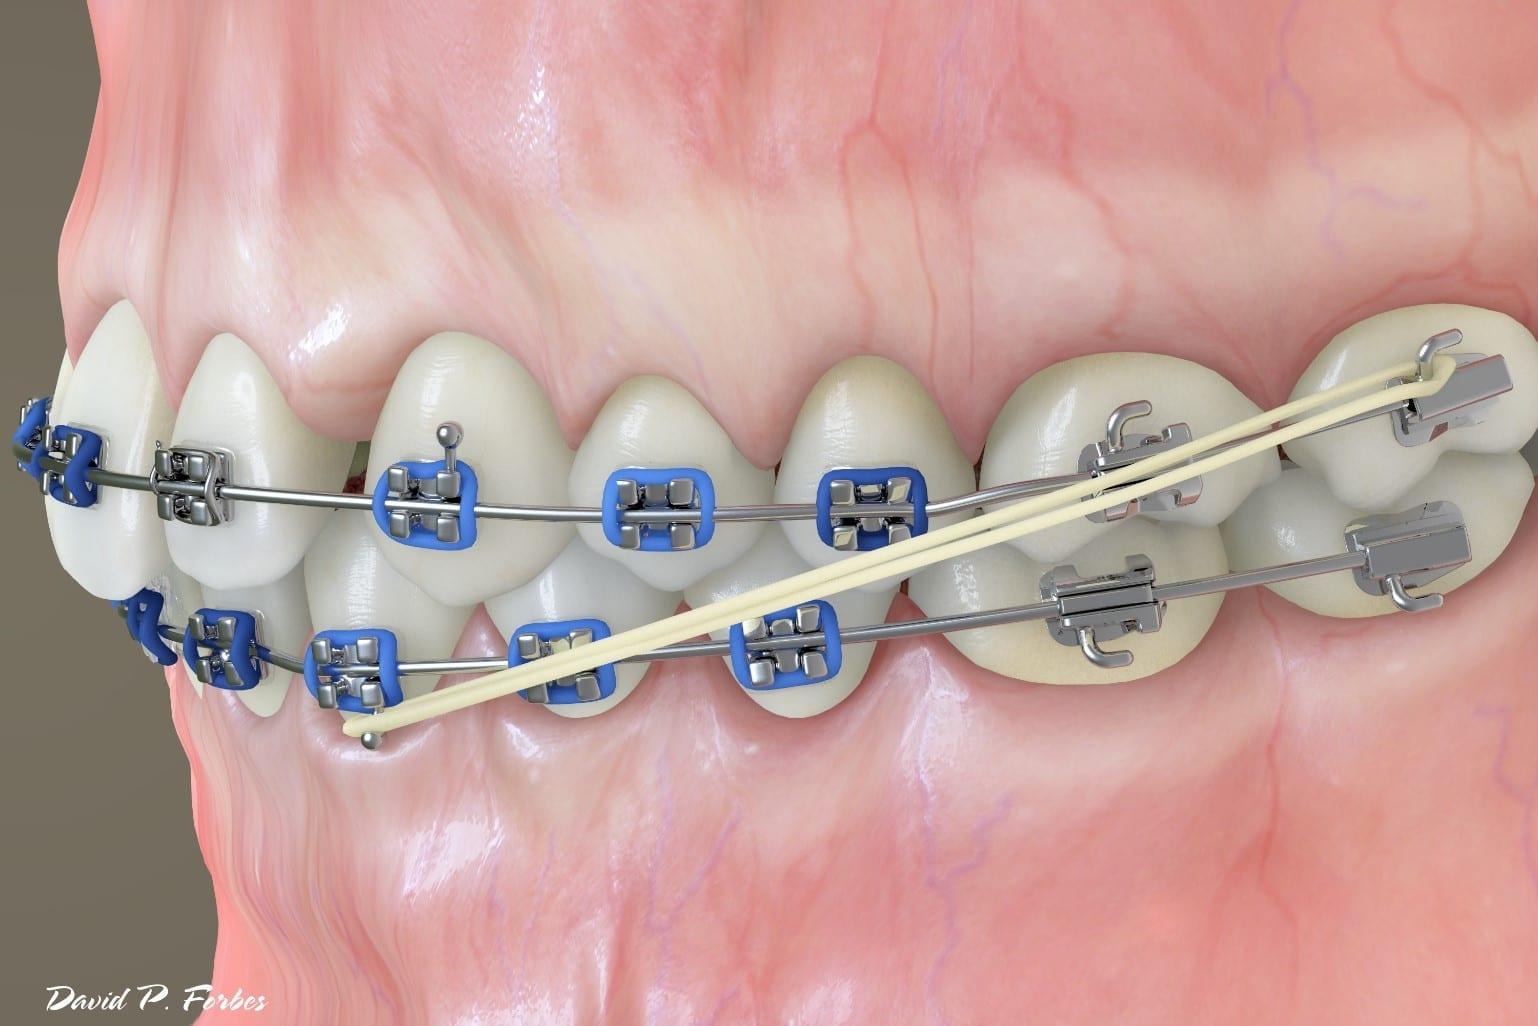 Treatment Auxillaries Elastics Rubber Bands Forbes